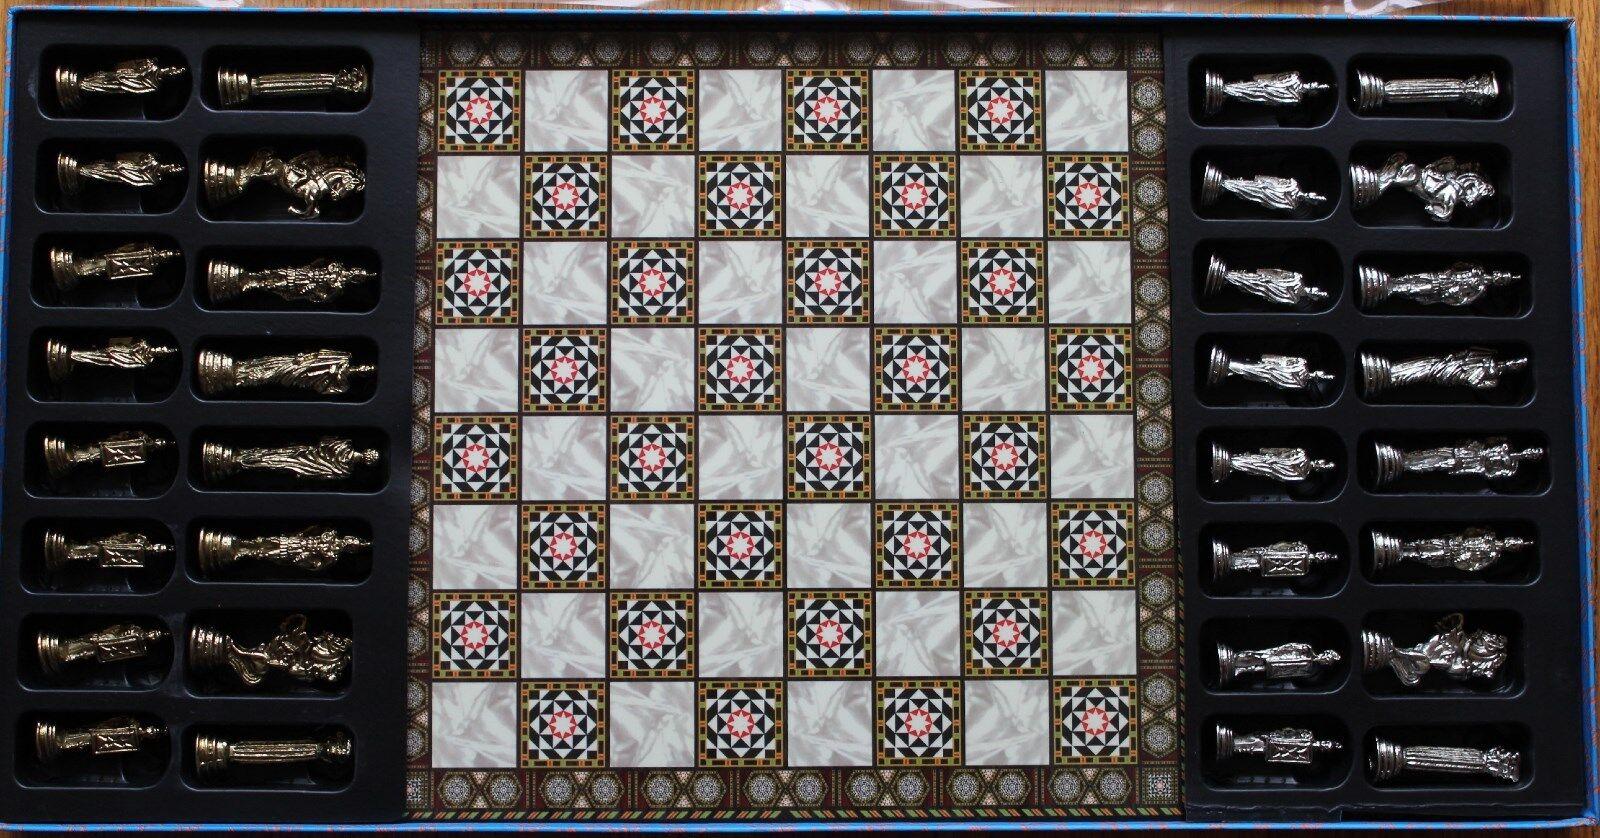 Metal Ancient Roman Figure & 11 x11  Compress Wood Board Chess Set